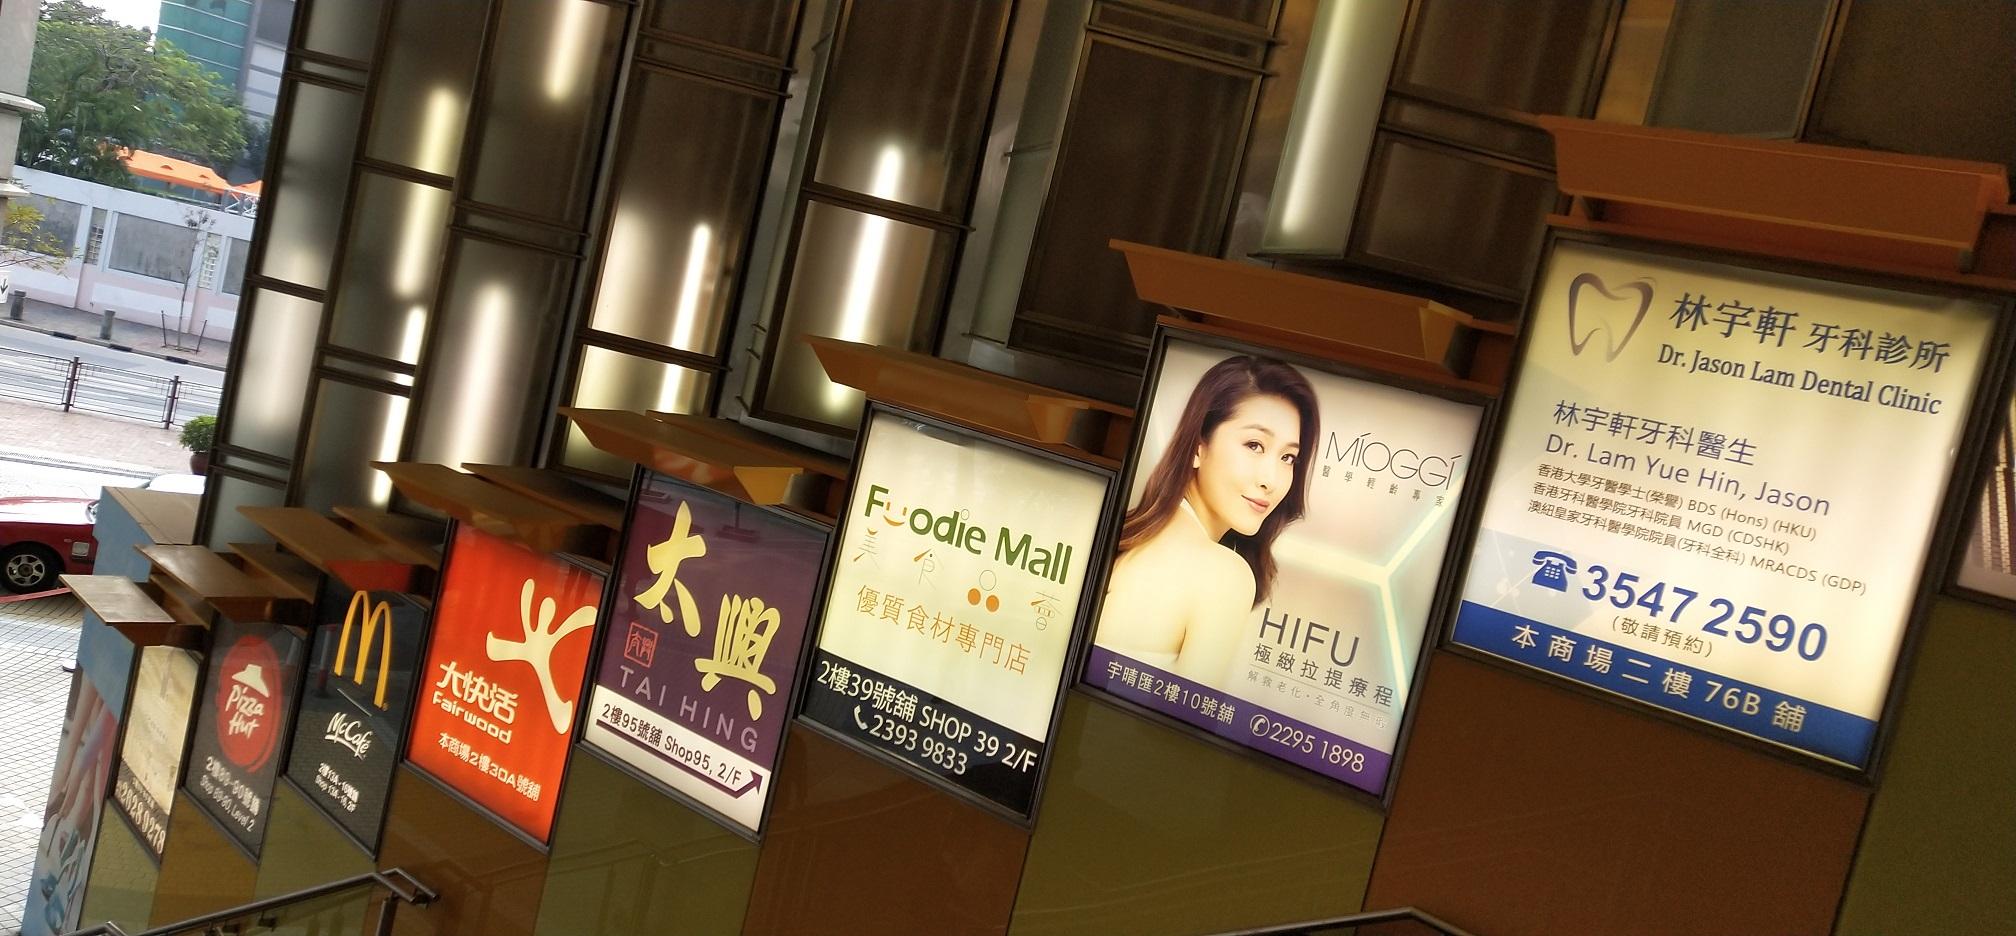 People can still find Pizza Huts and McDonald's at Hong Kong's neighborhood malls